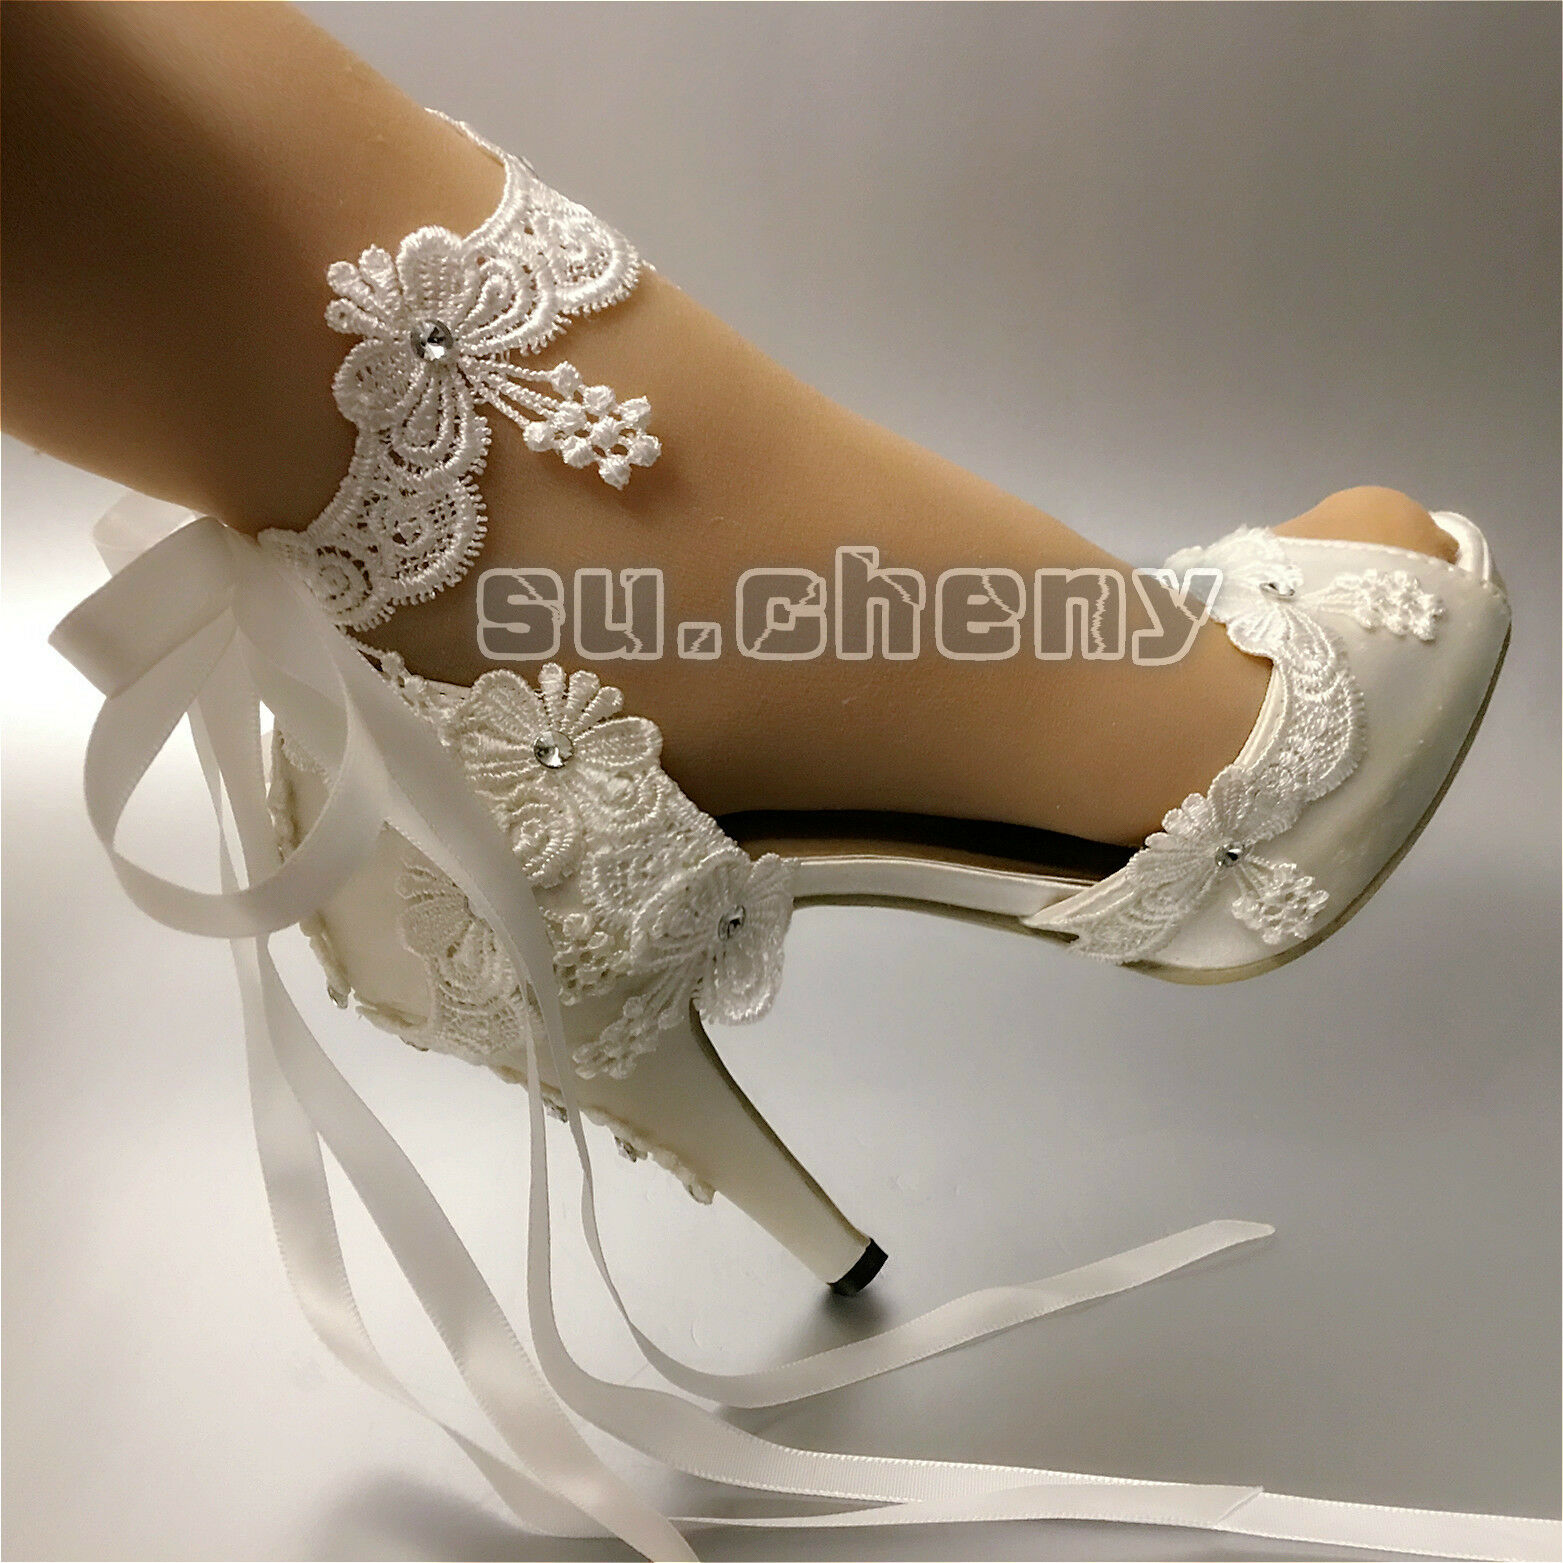 Su.cheny Ribbon anklet blanc blanc blanc ivory satin open toe heel Wedding Bridal chaussures Taille 667ba0